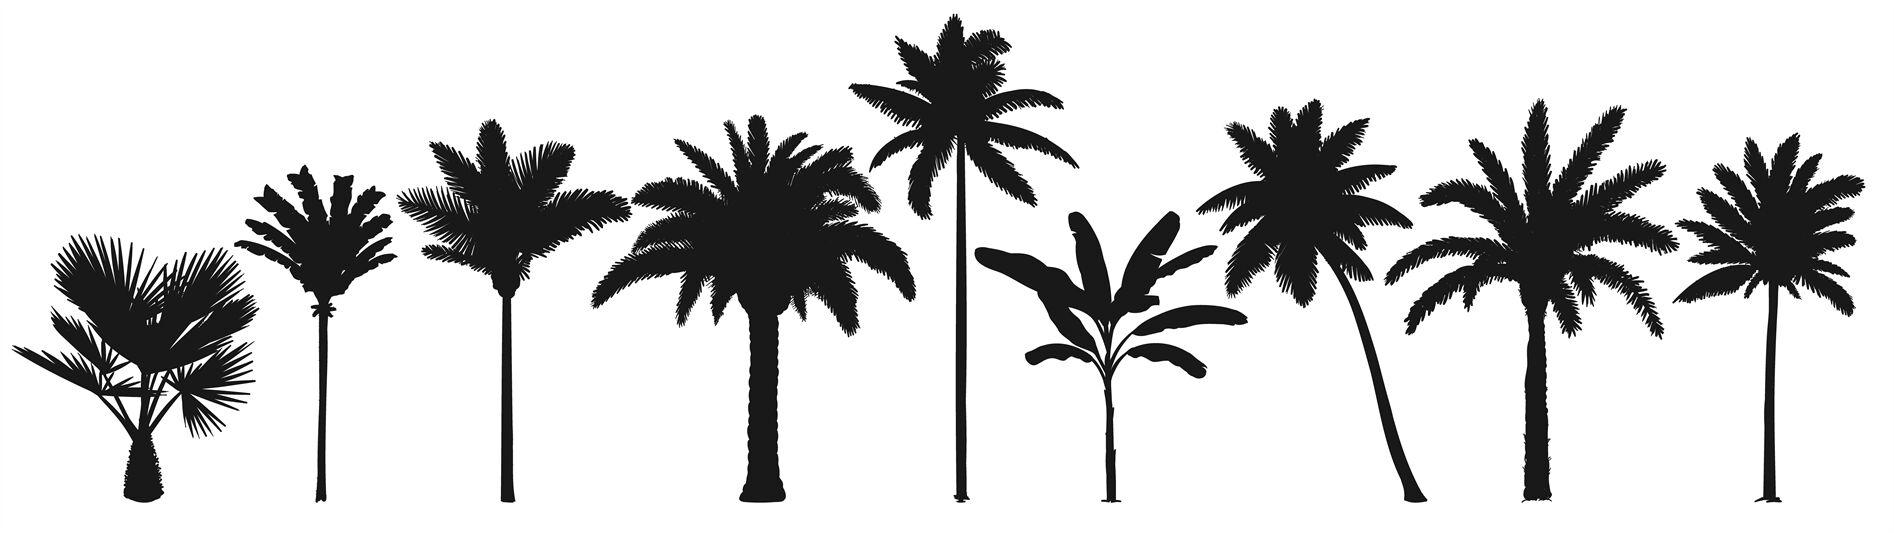 Palm Trees Silhouette Retro Coconut Trees Hand Drawn Tropical